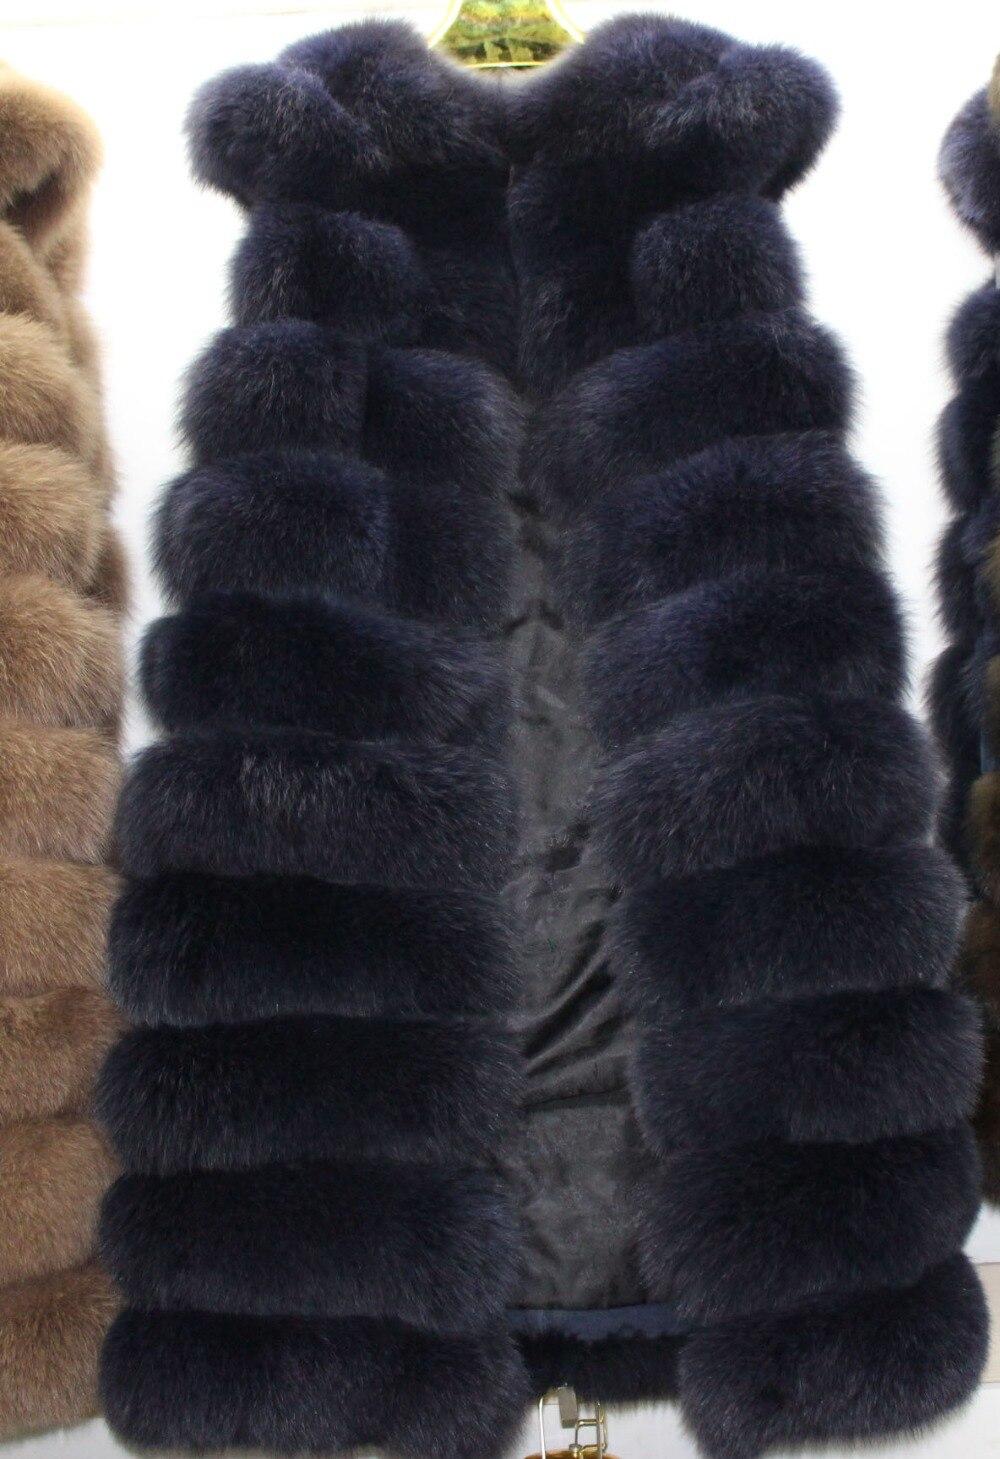 Linhaoshengyue 110cm Long  Real  Fox  Fur  Vest